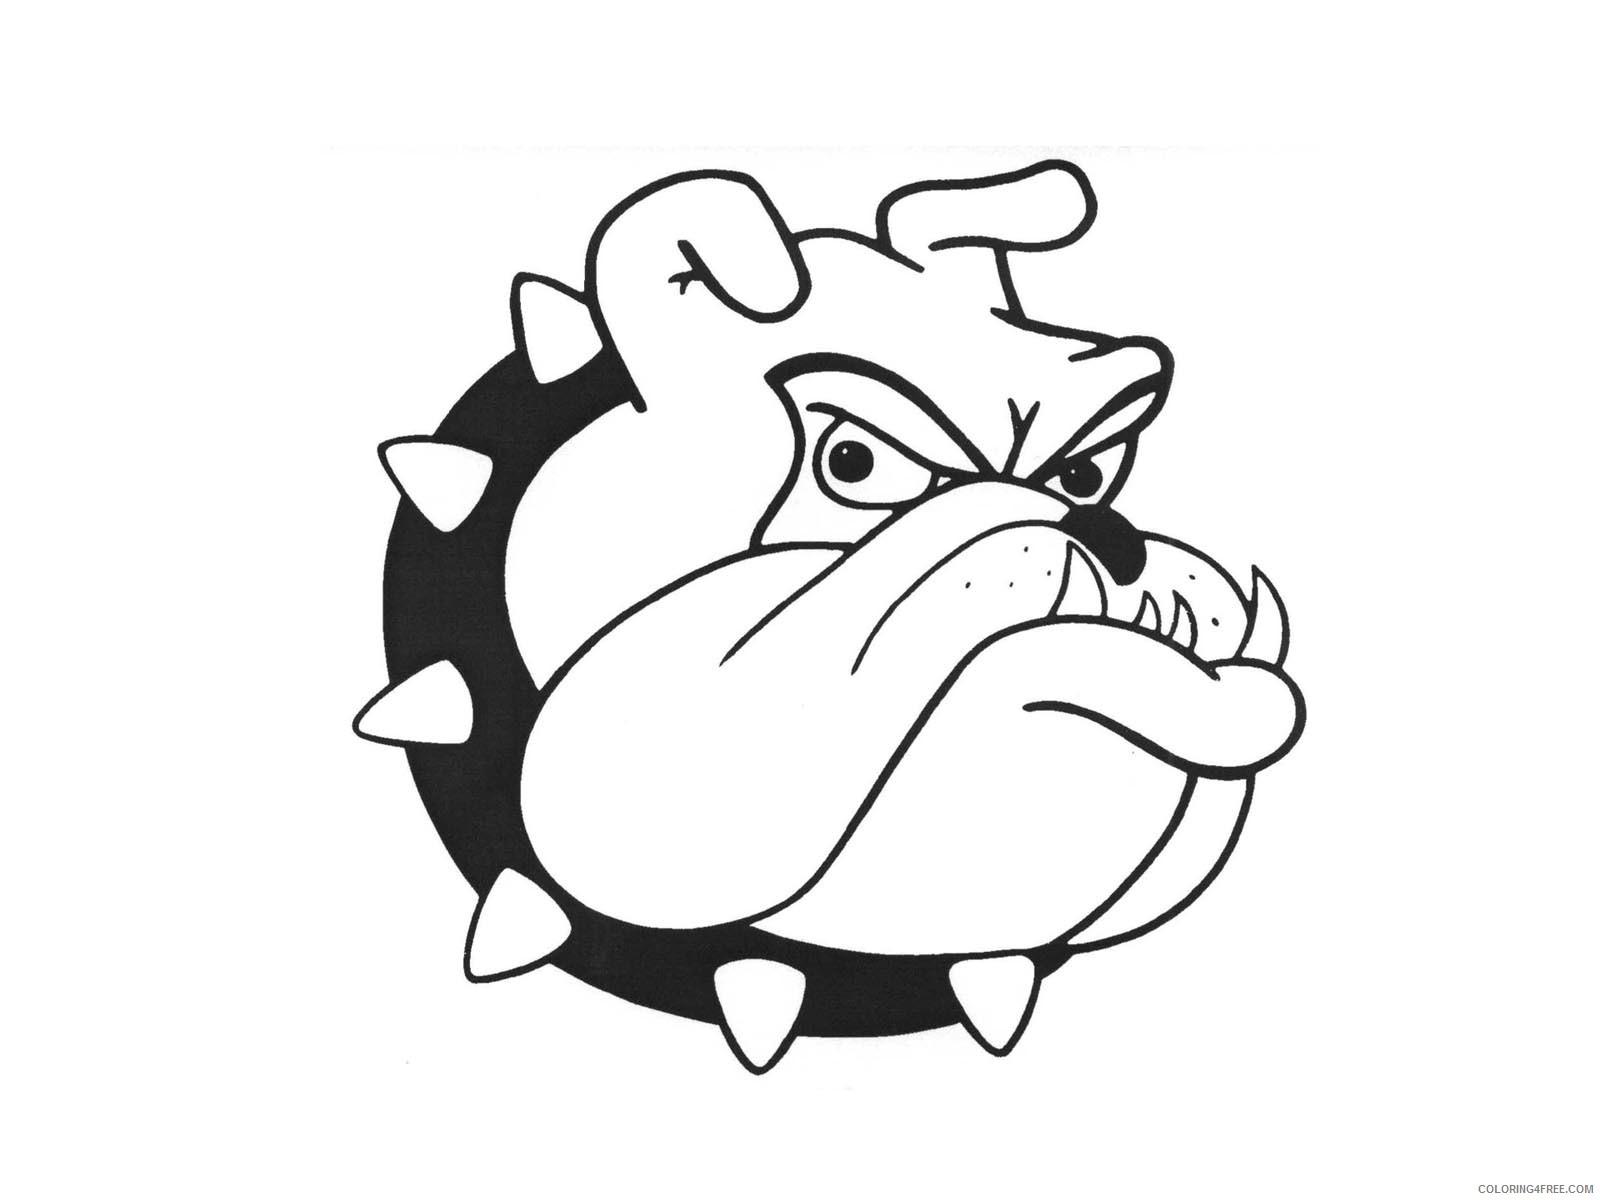 Bulldog Cartoon Coloring Pages 14 Cartoon Bulldog Images Free Printable Coloring4free Coloring4free Com